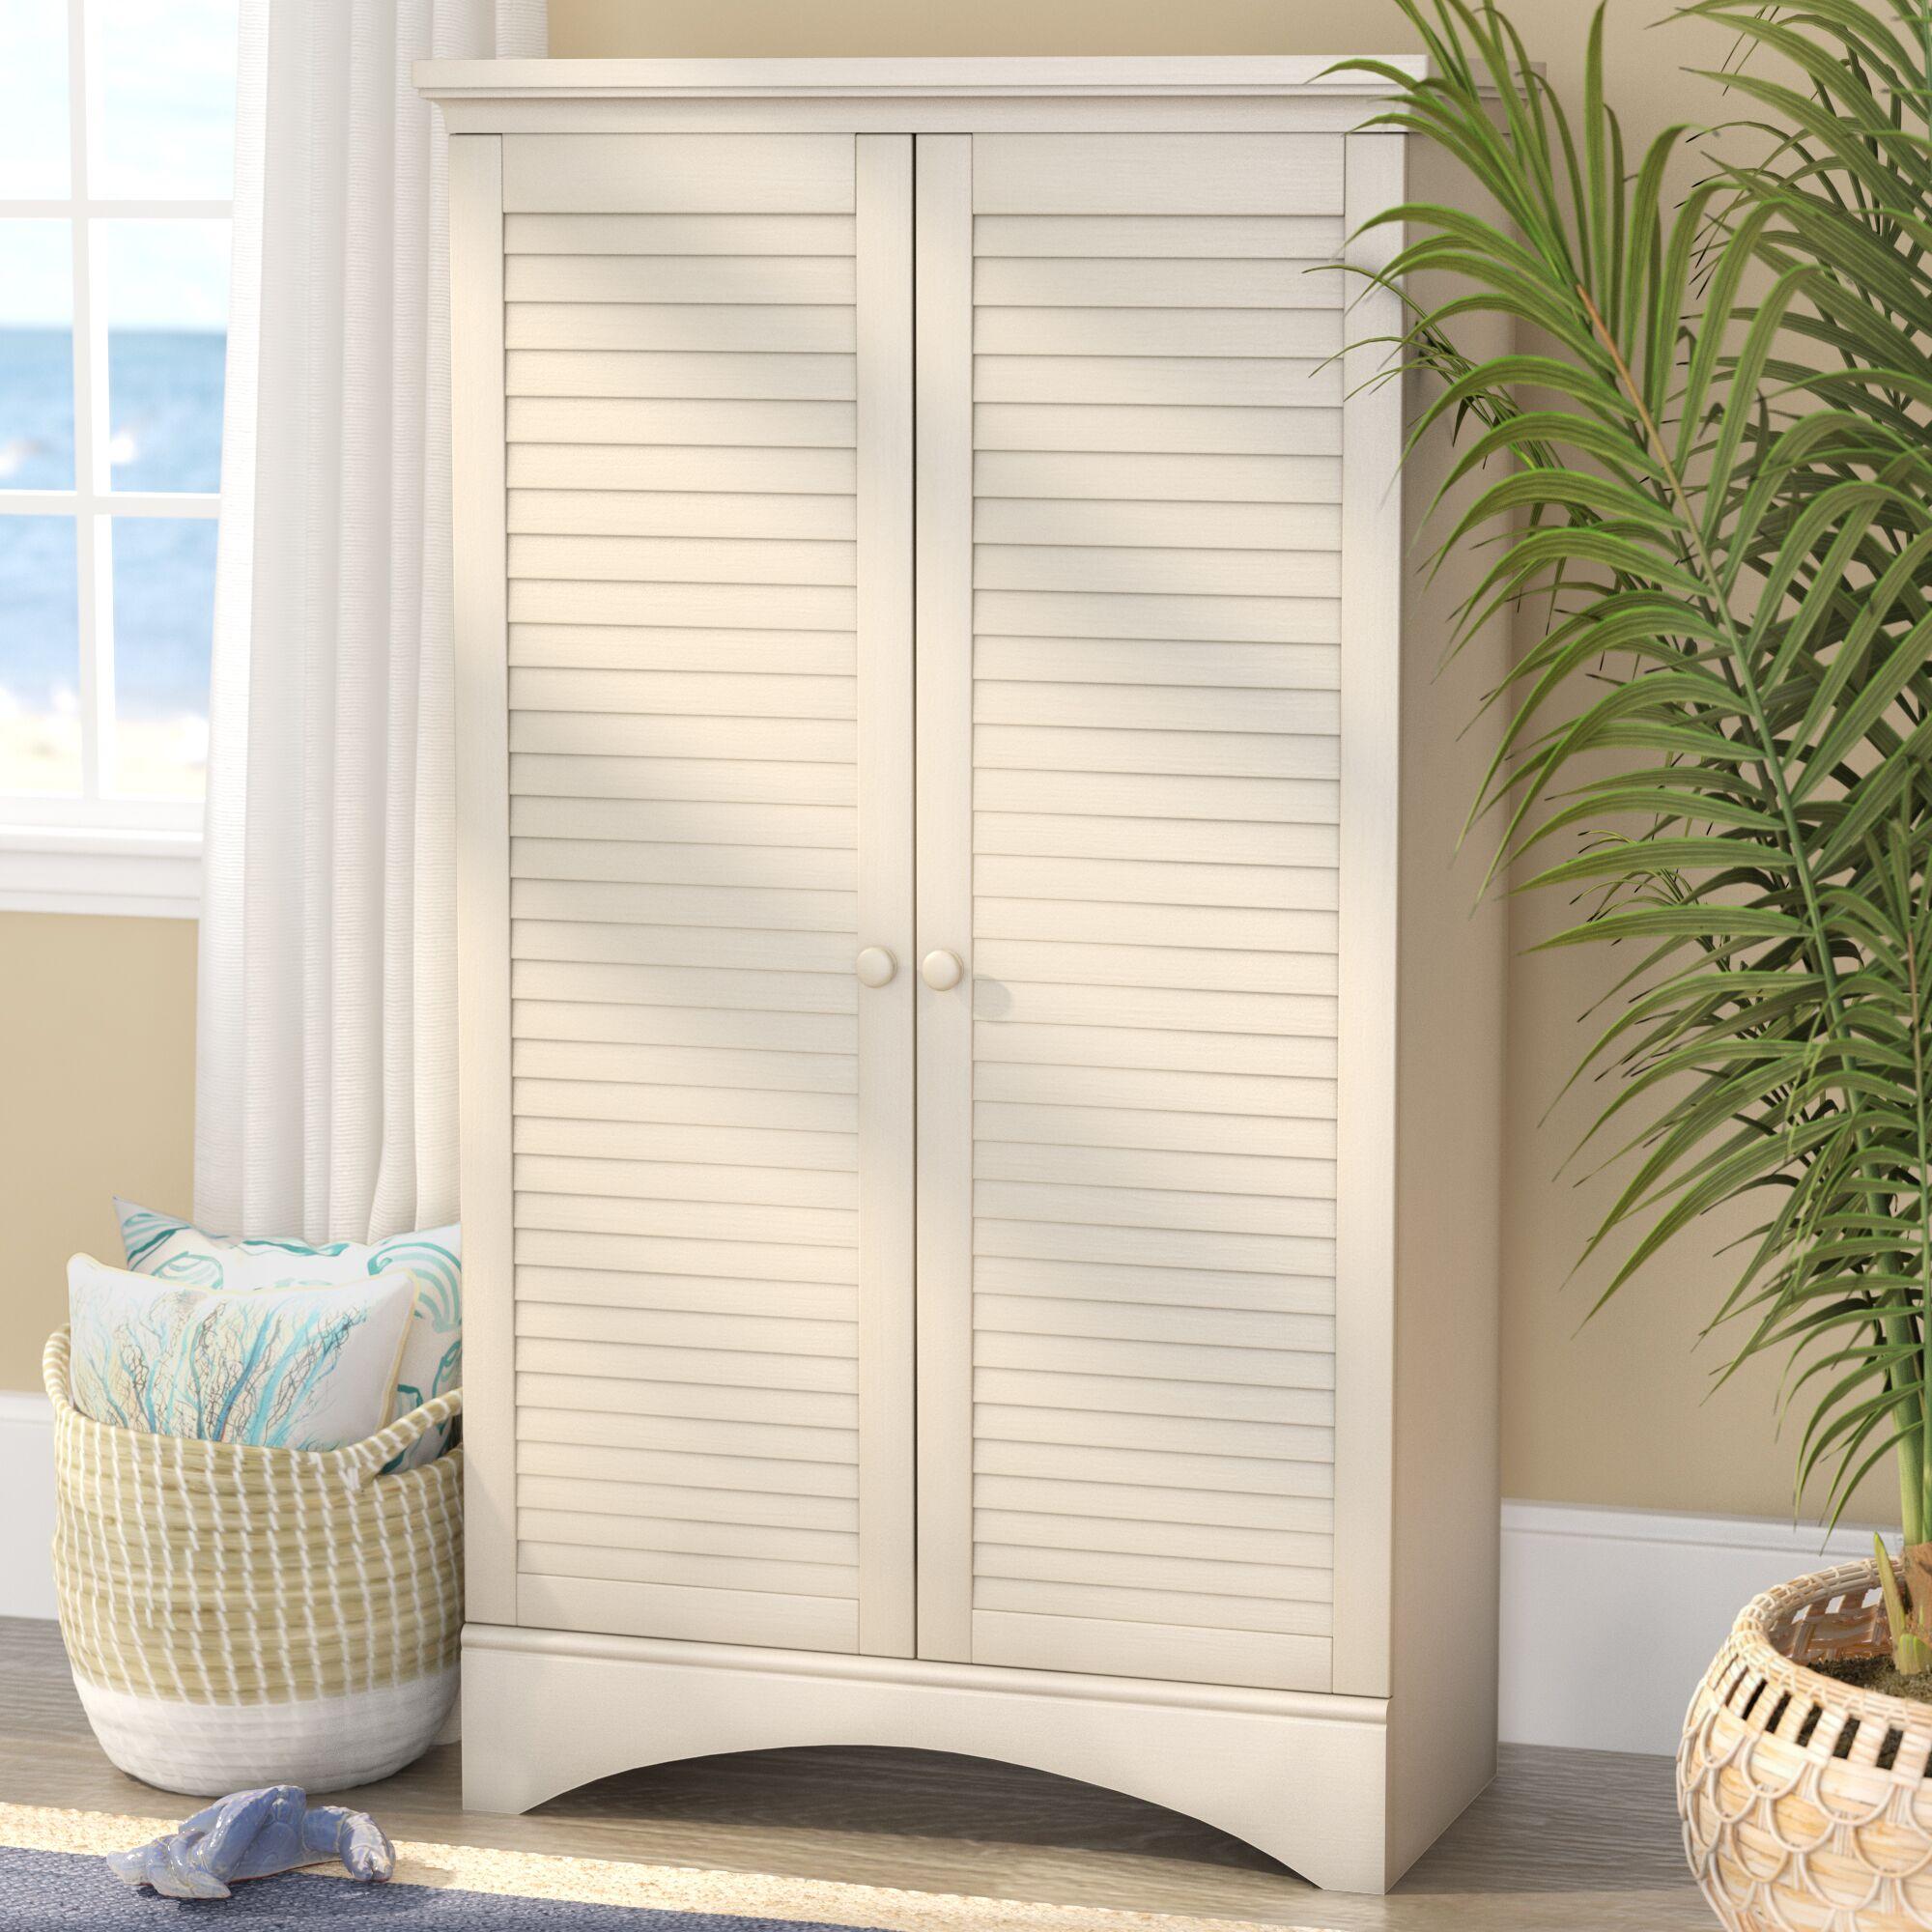 Pinellas 2 Door Armoire Color: Antique White